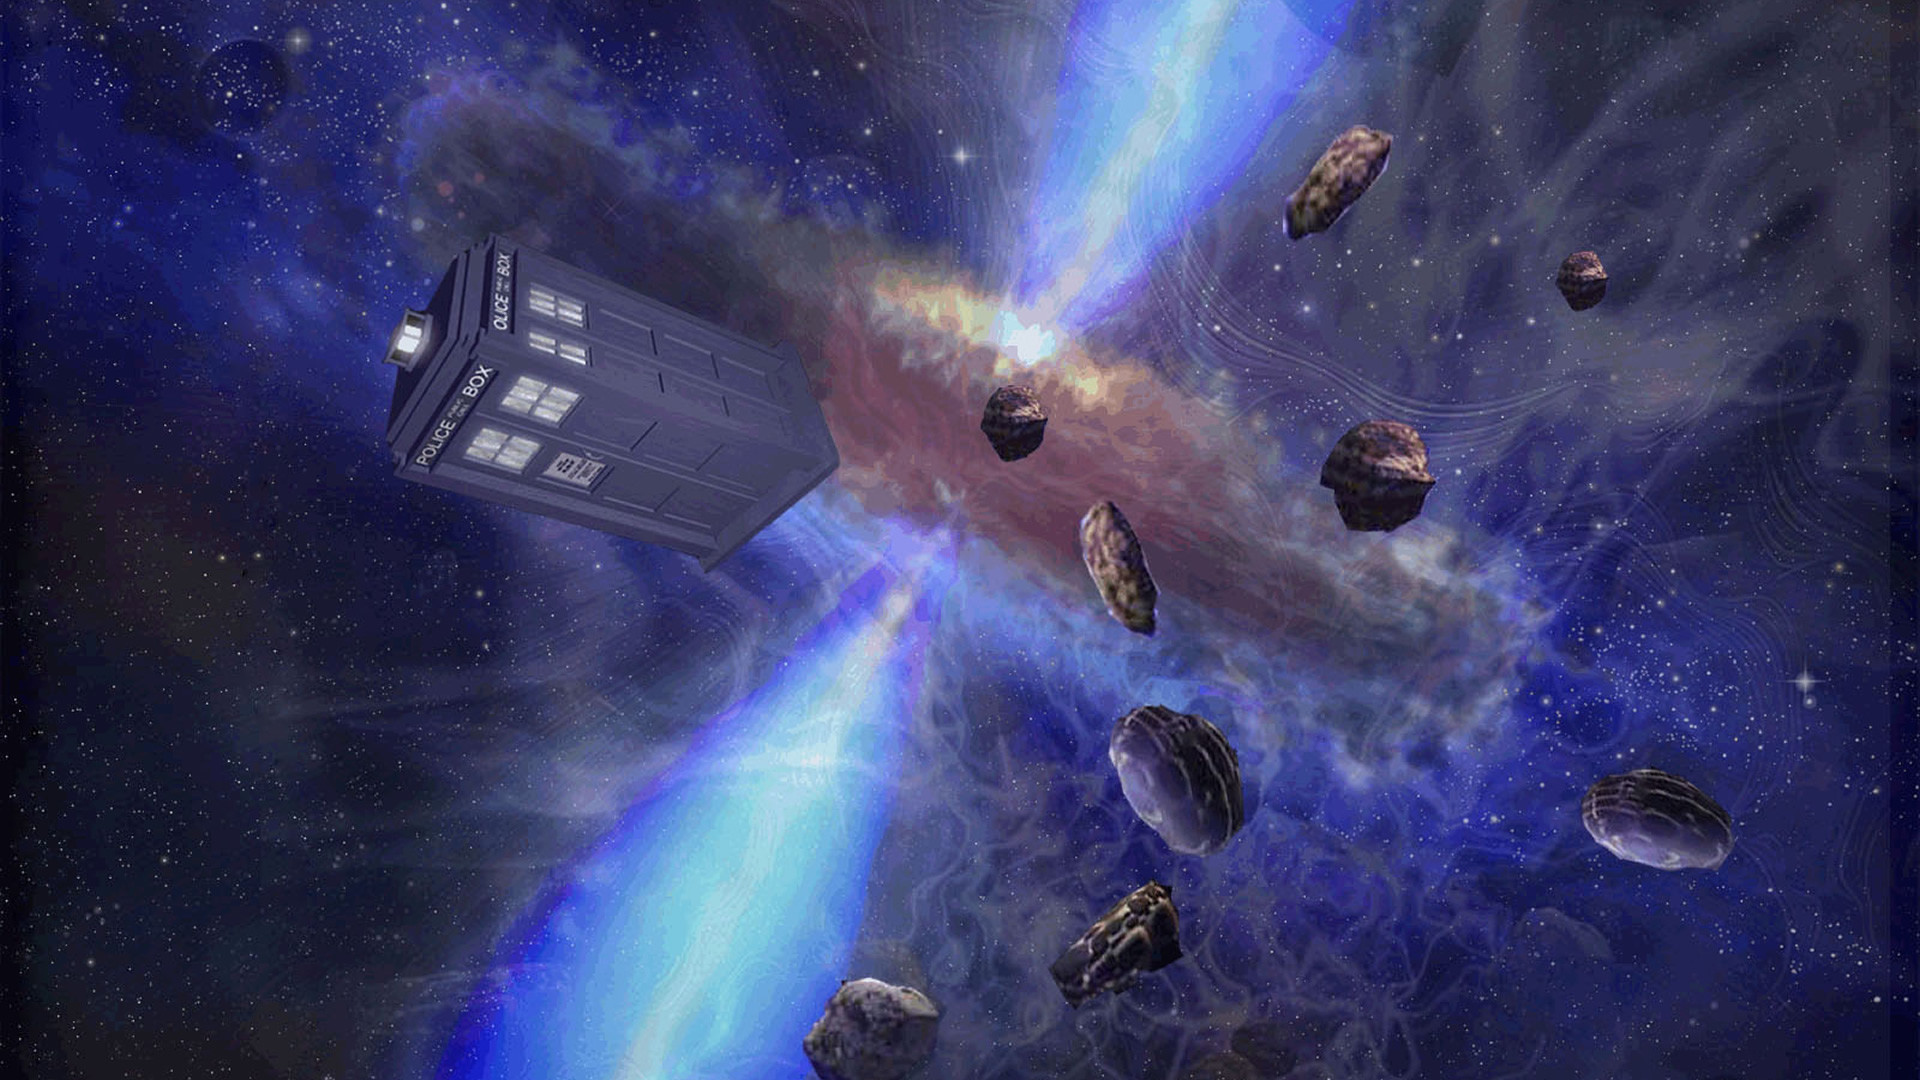 Doctor Who Tardis HD Wallpaper. « »